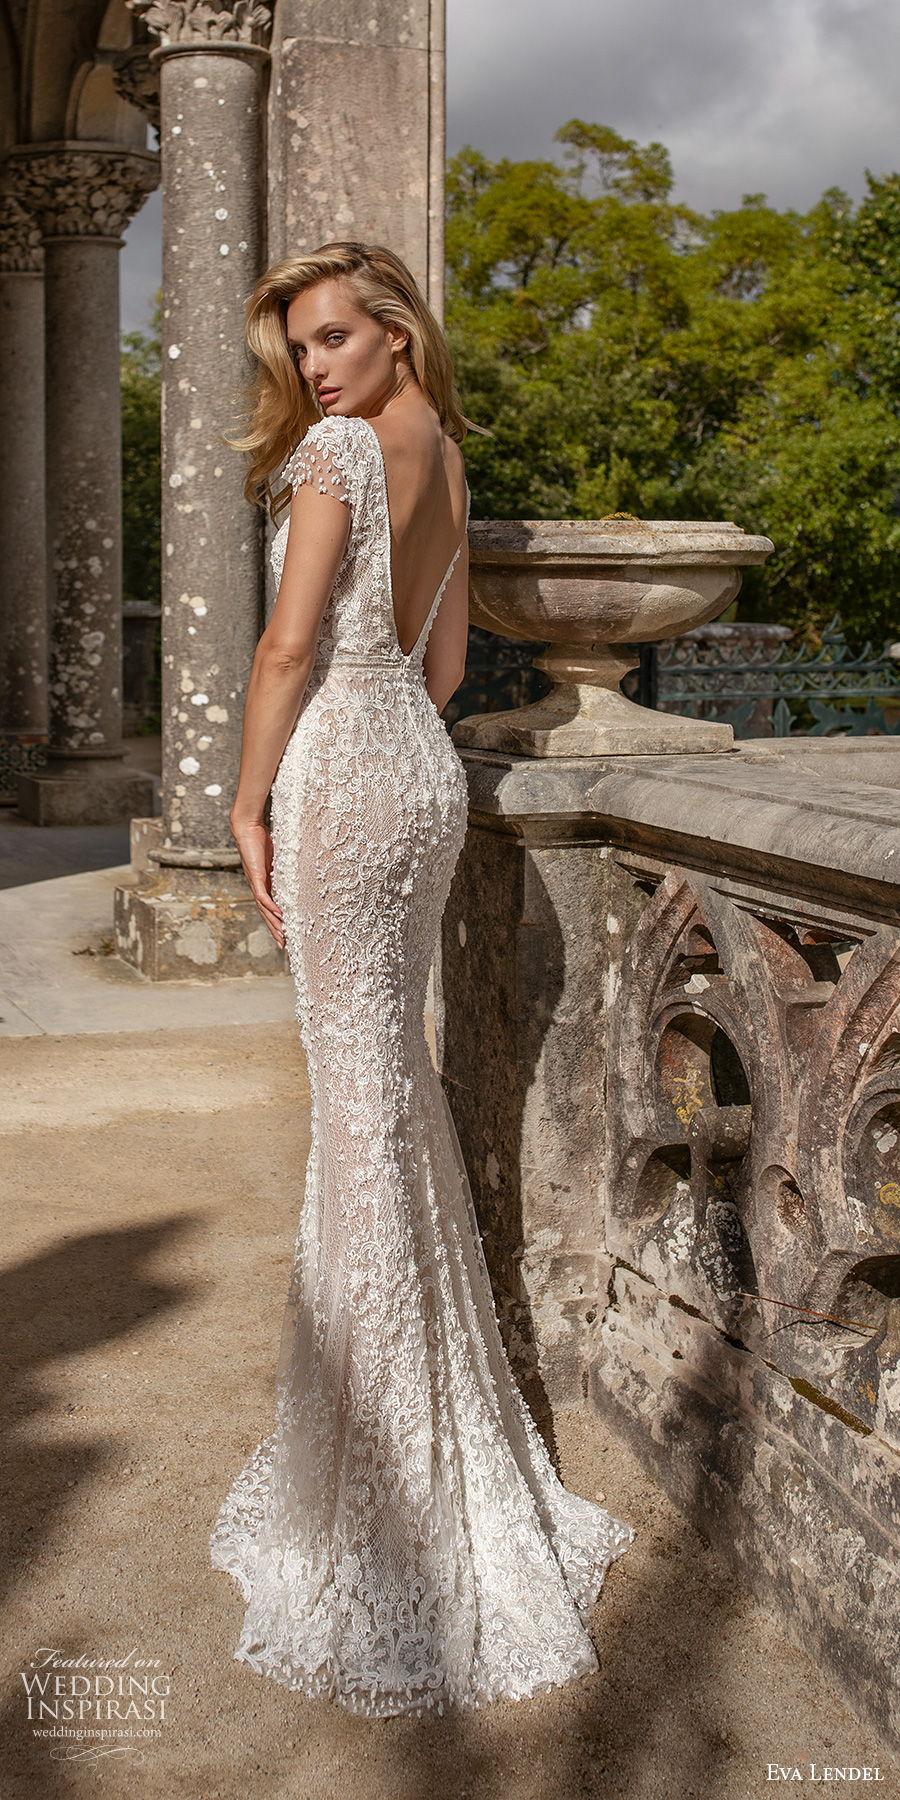 eva lendel 2020 lisbon vibes bridal cap sleeves deep v neck full embellishment romantic fit and flare wedding dress backless v back chapel train (3) bv